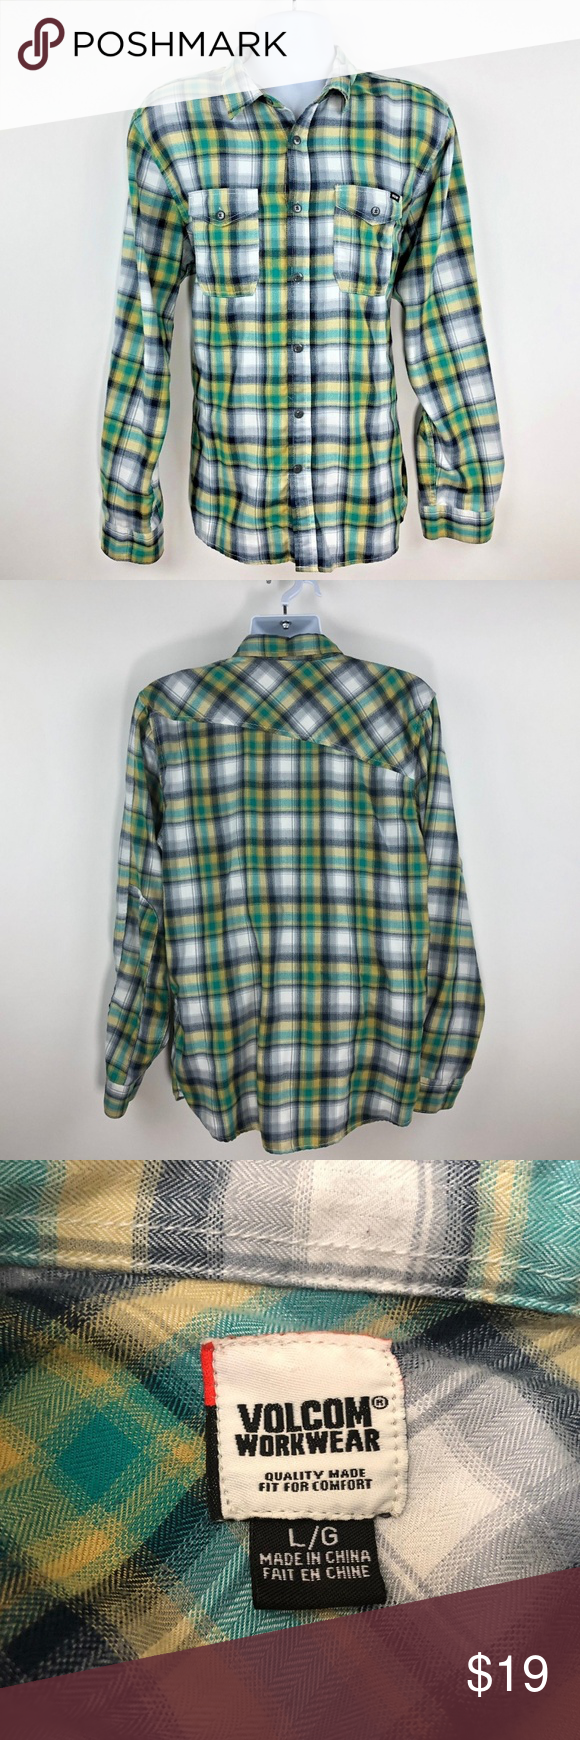 Volcom Workwear Mens Green Yellow Plaid Shirt  My Posh Closet